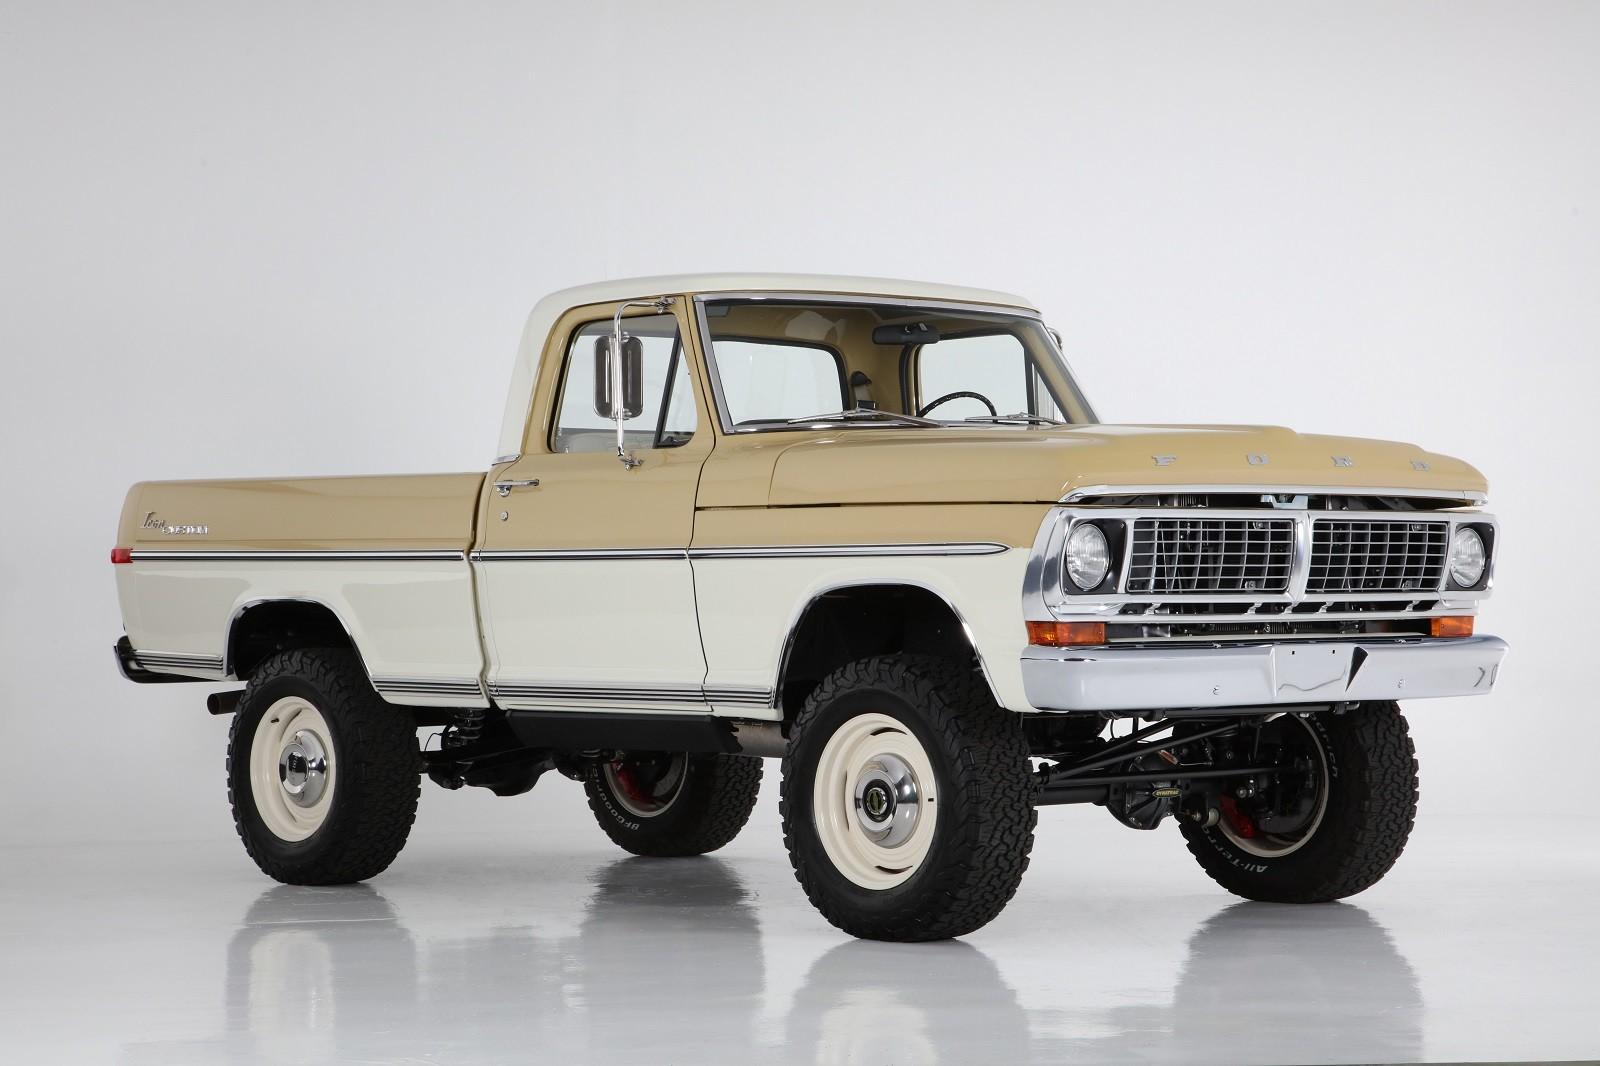 Foto de ICON 4x4 Ranger 1970 Reformer Series (9/38)